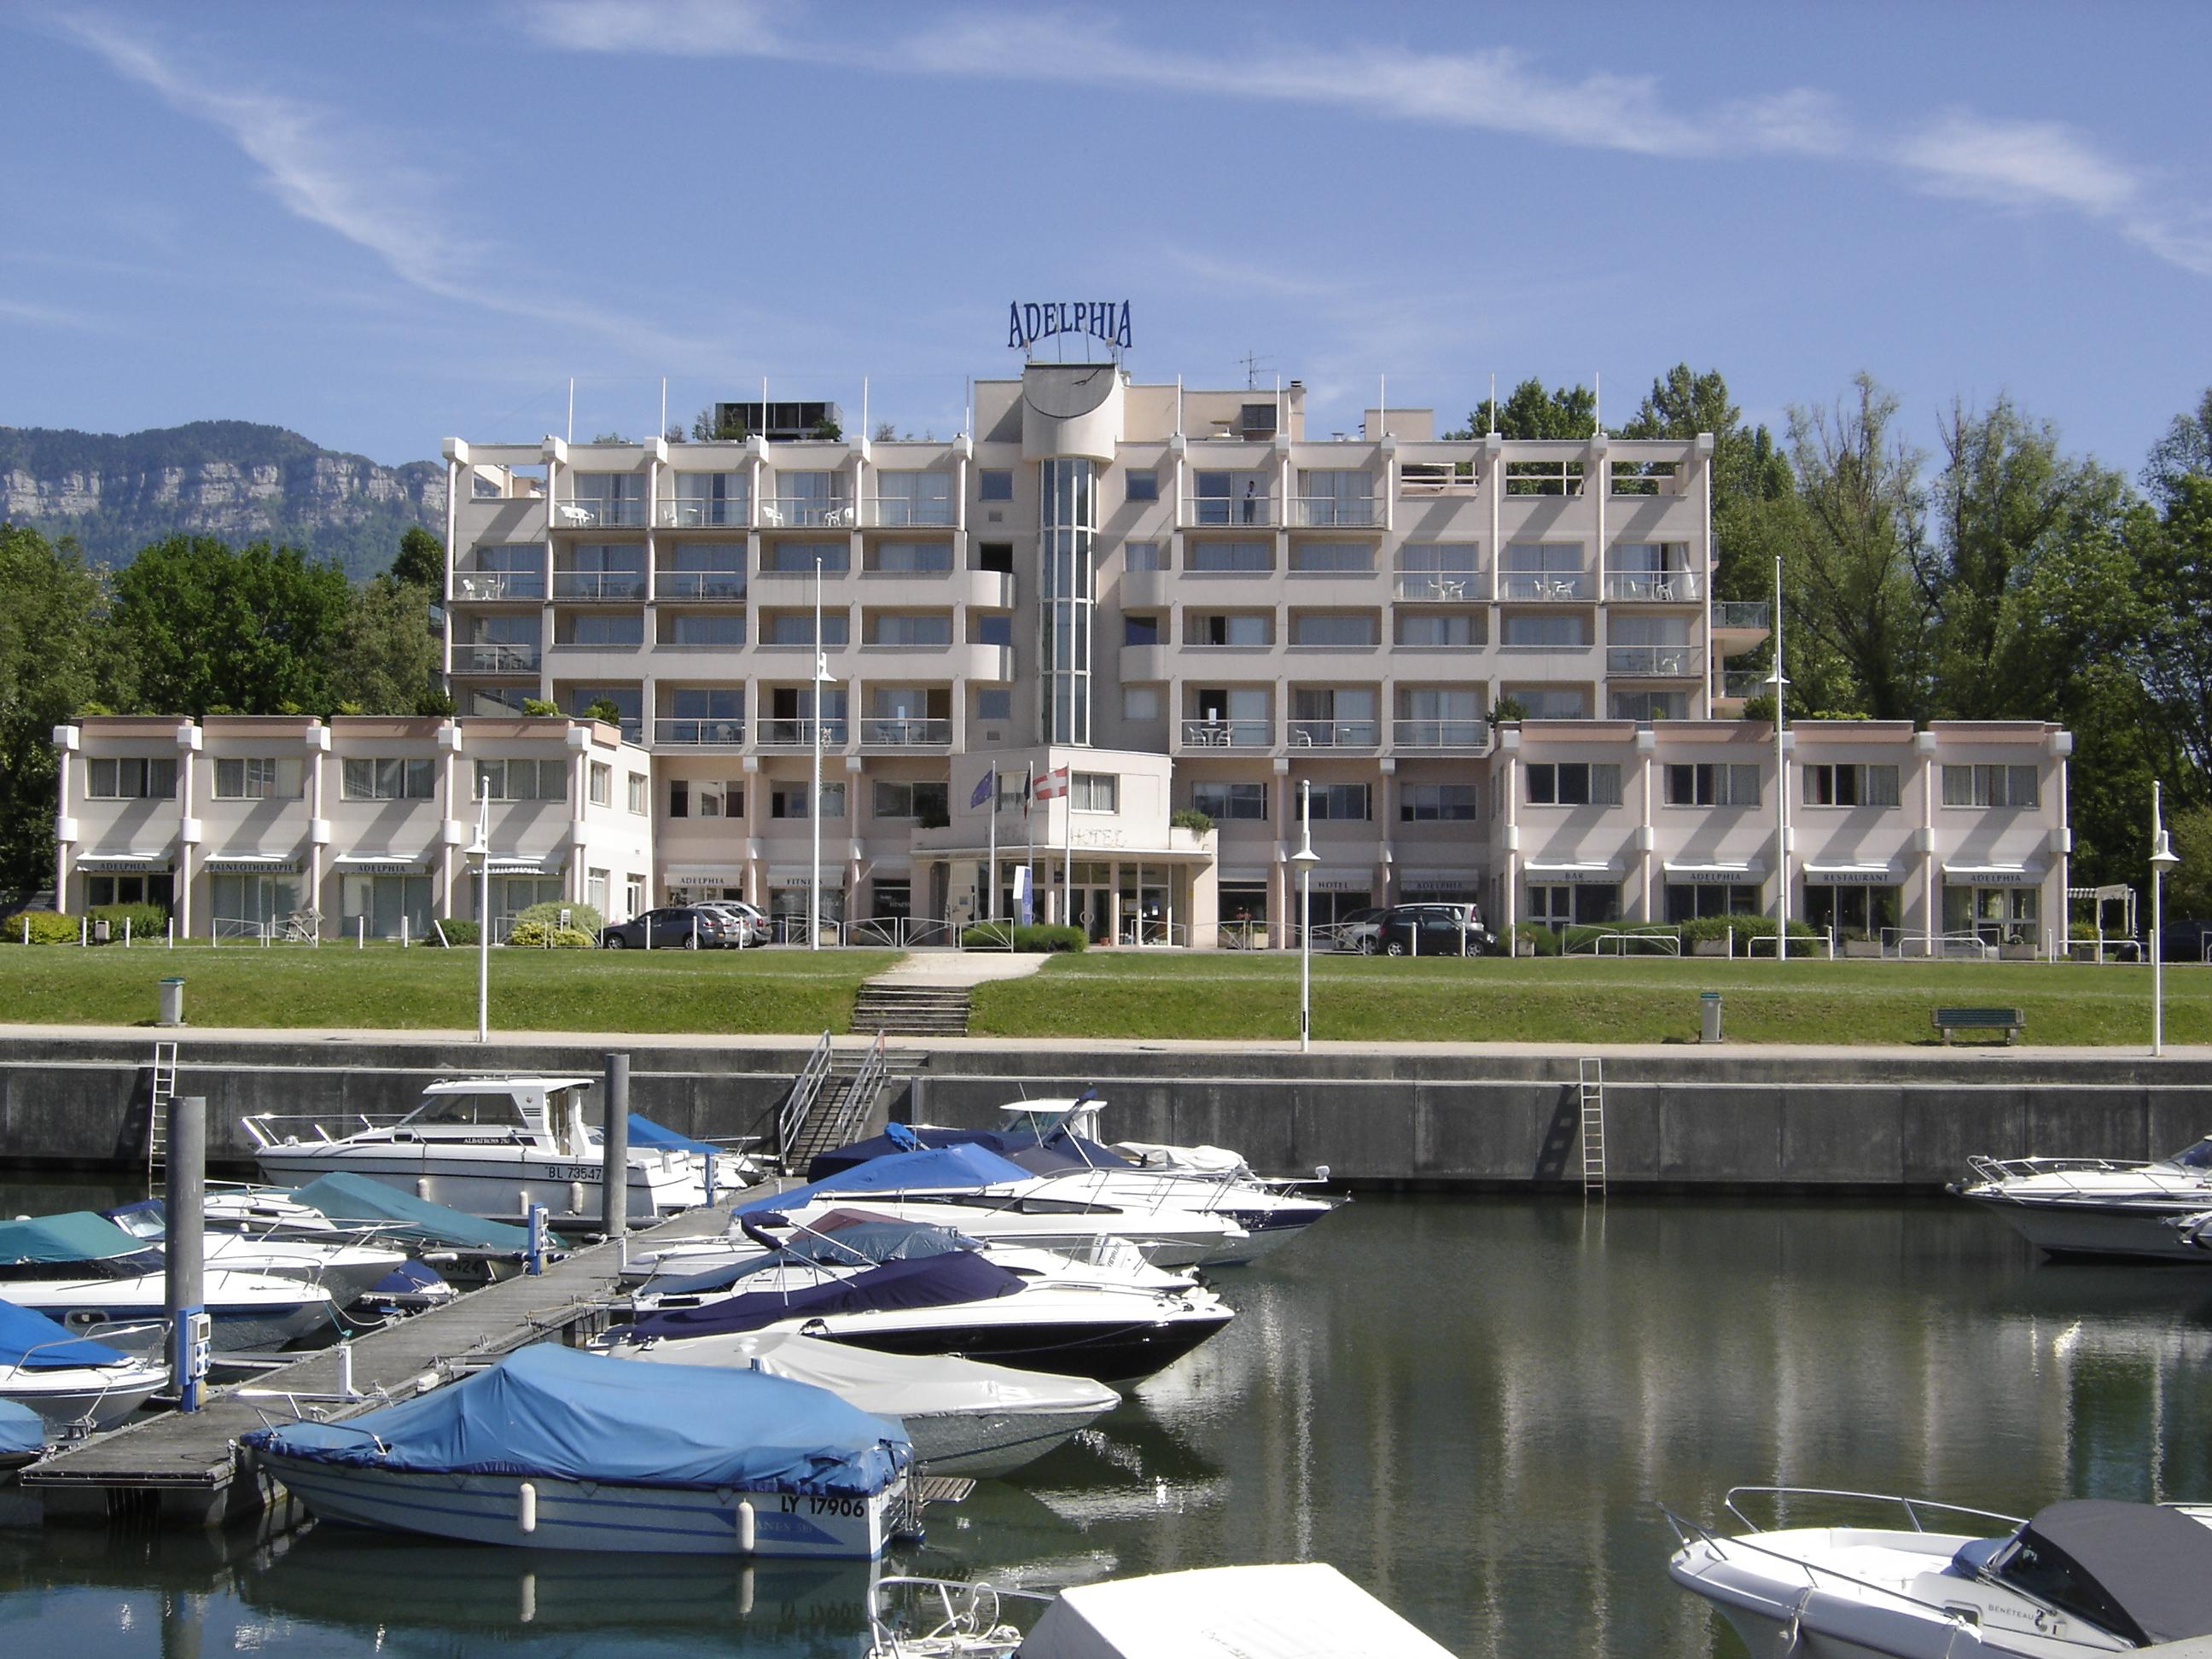 Salle Platon Hôtel Marina Adelphia**** Aix les bains